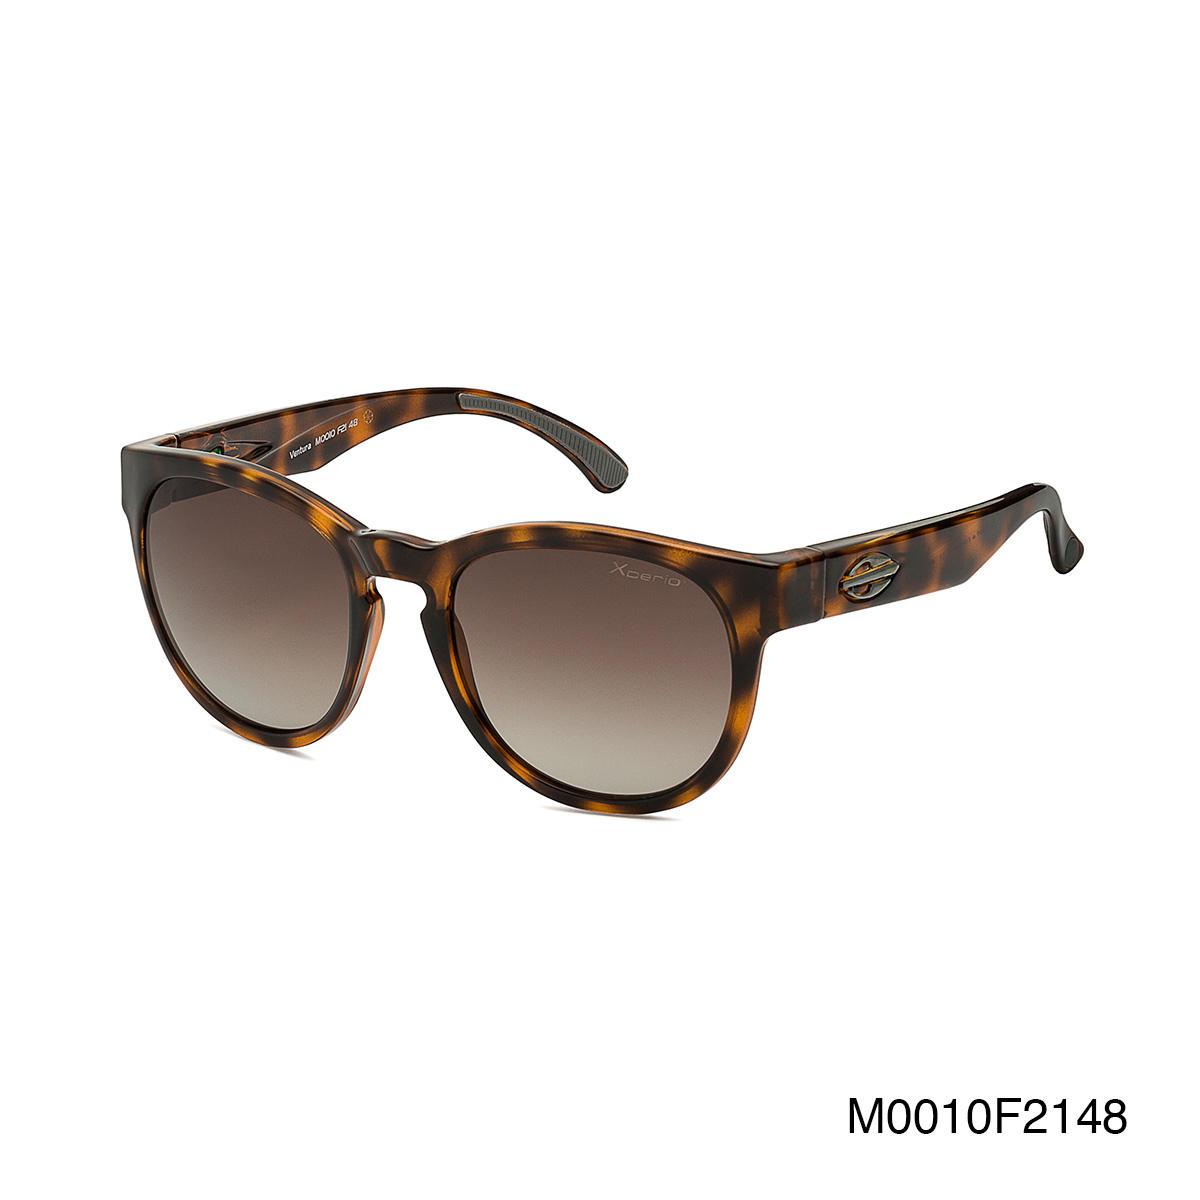 b33e6a1c115cc Óculos de Sol Femininos   Mormaii Ventura Polarizado M0010